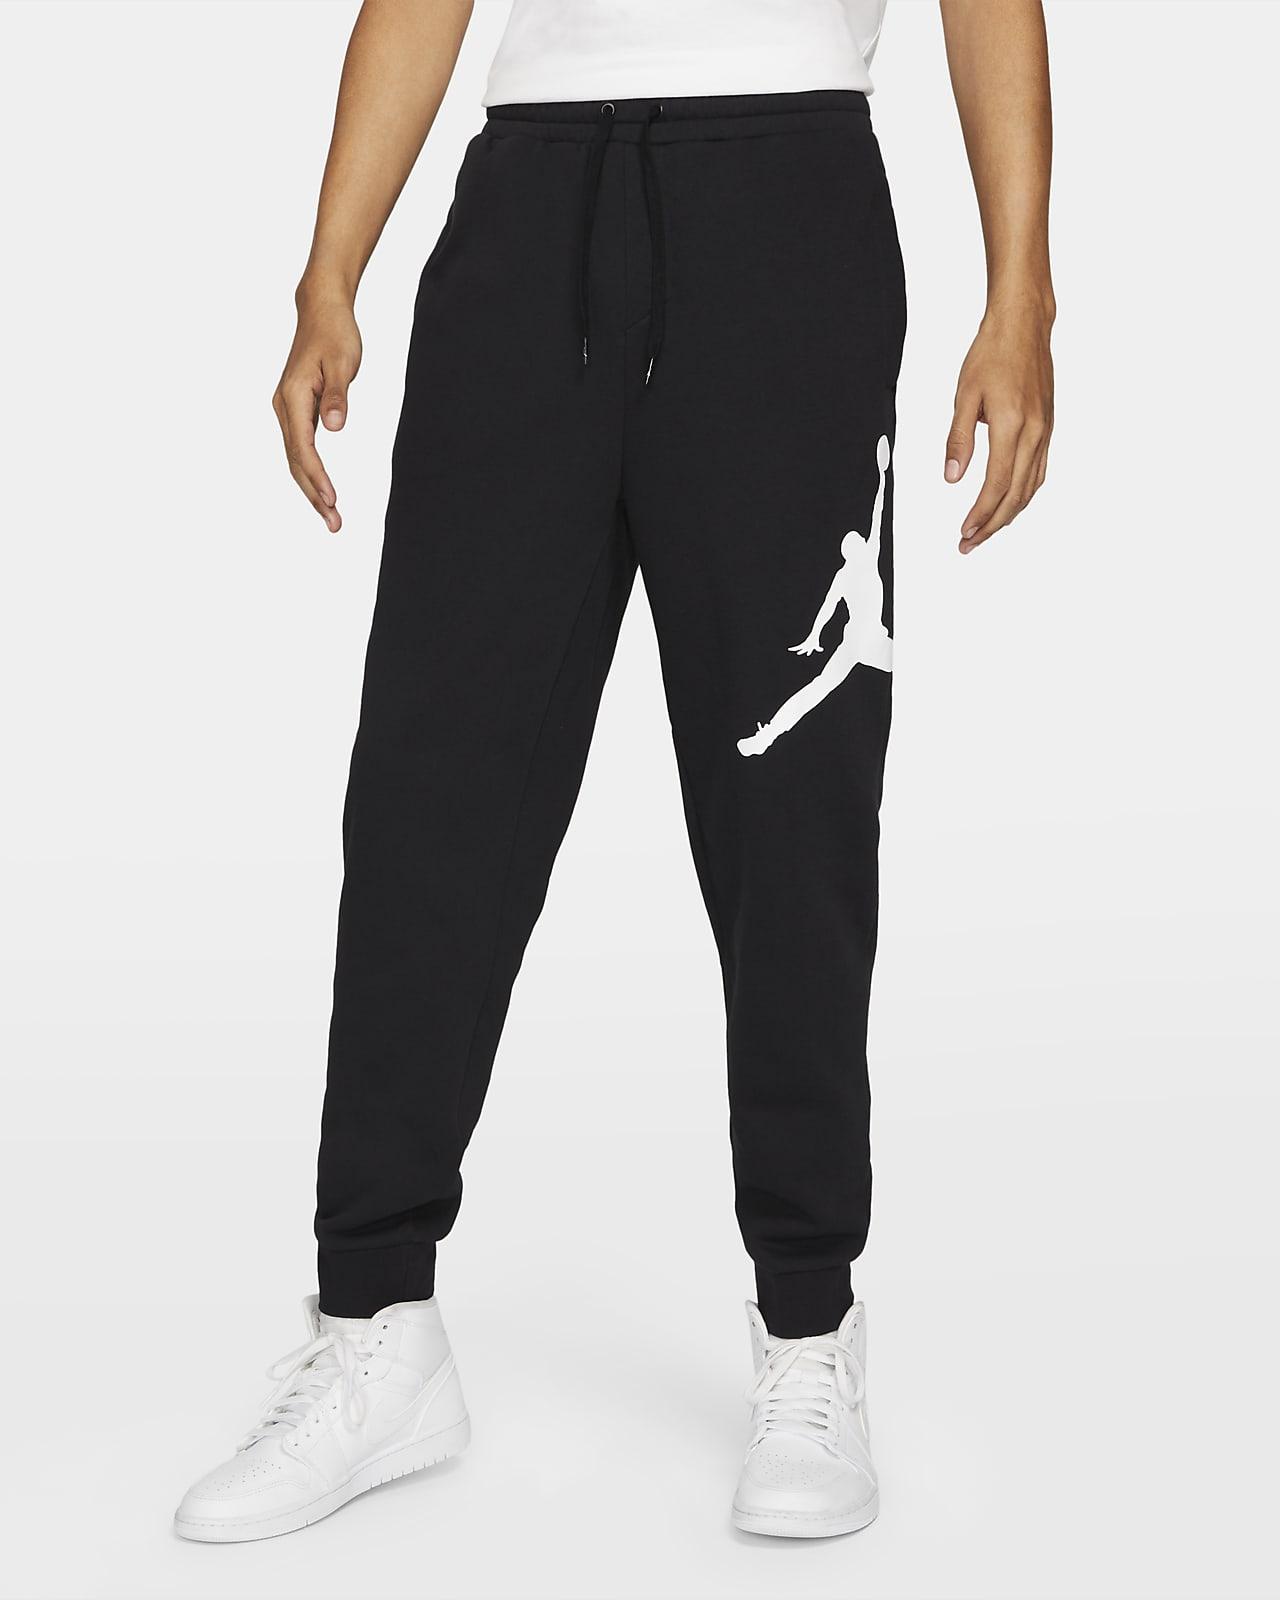 Jordan Jumpman Logo Men's Fleece Pants